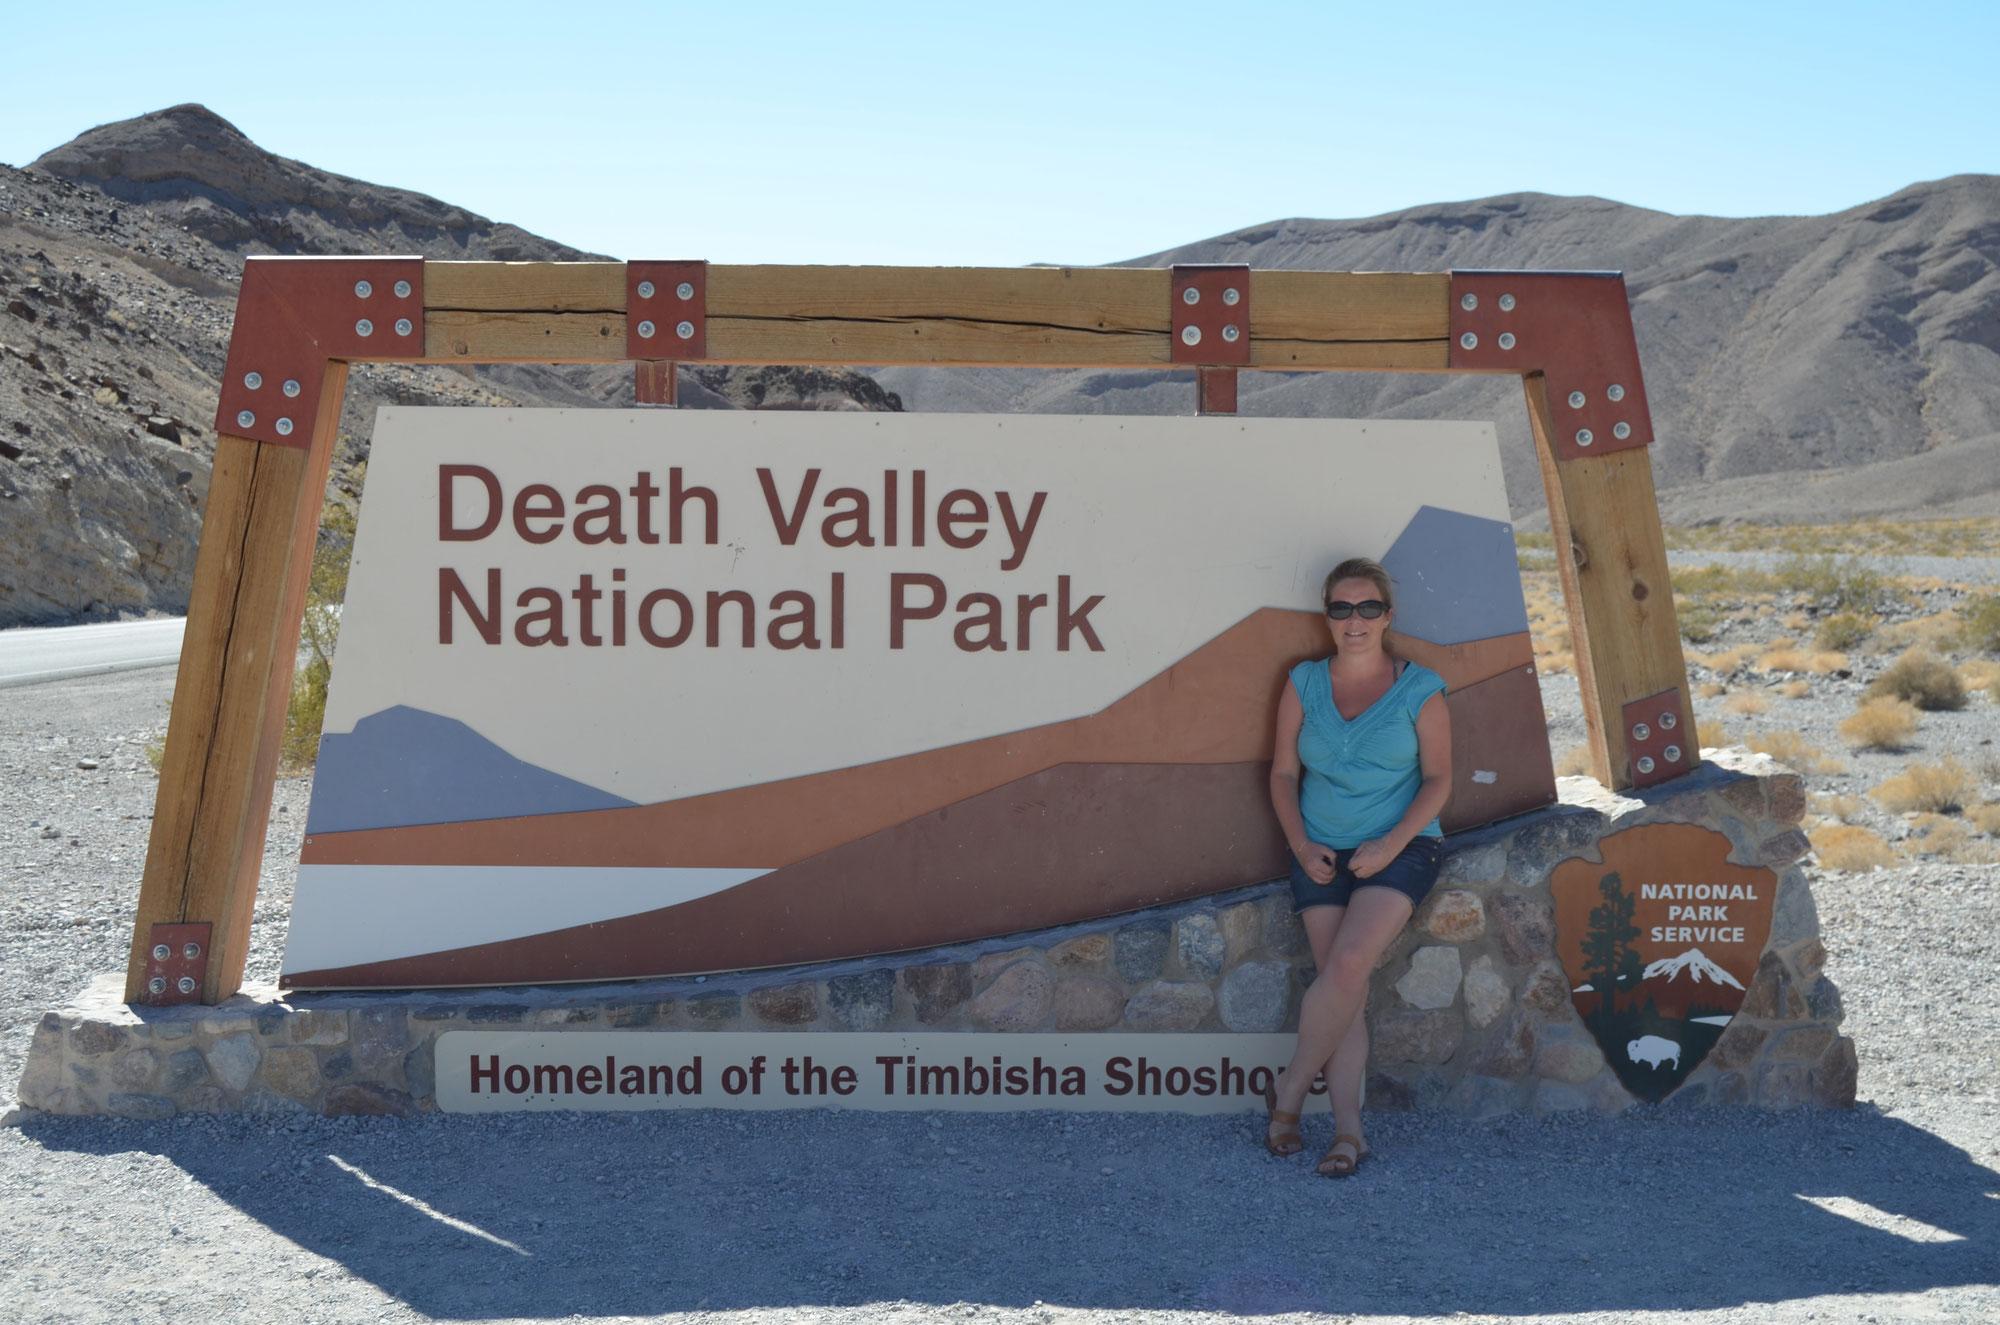 ROAD TRIP USA - Death Valley